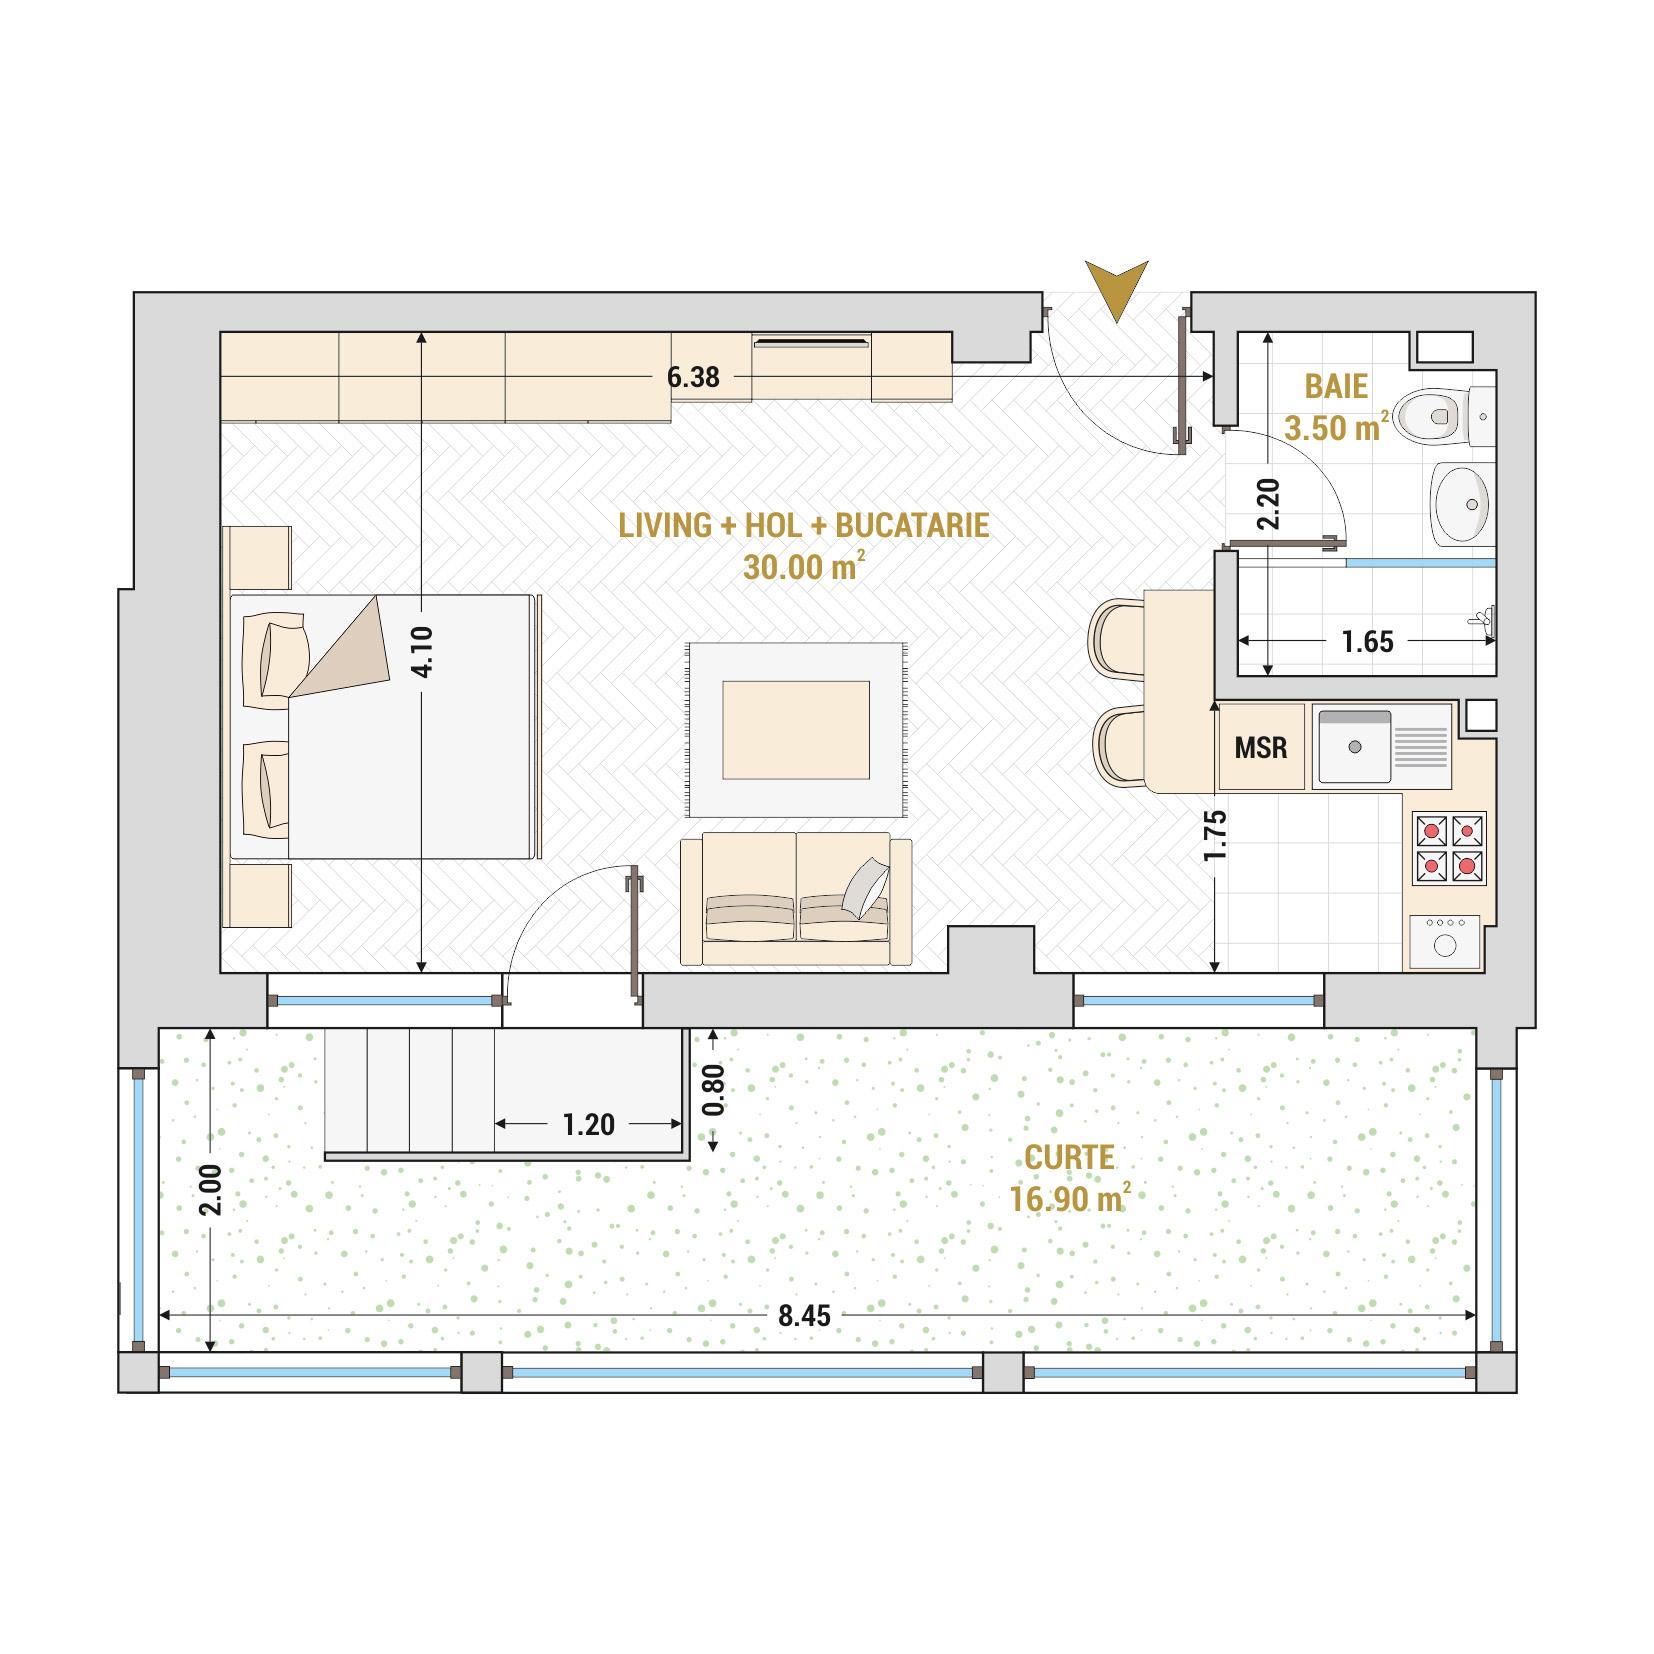 Garsoniere de vanzare Bucuresti - Catedral Residence - Marriott, Piata Unirii, 13 Septembrie, Izvor - Tip 8 - T1A